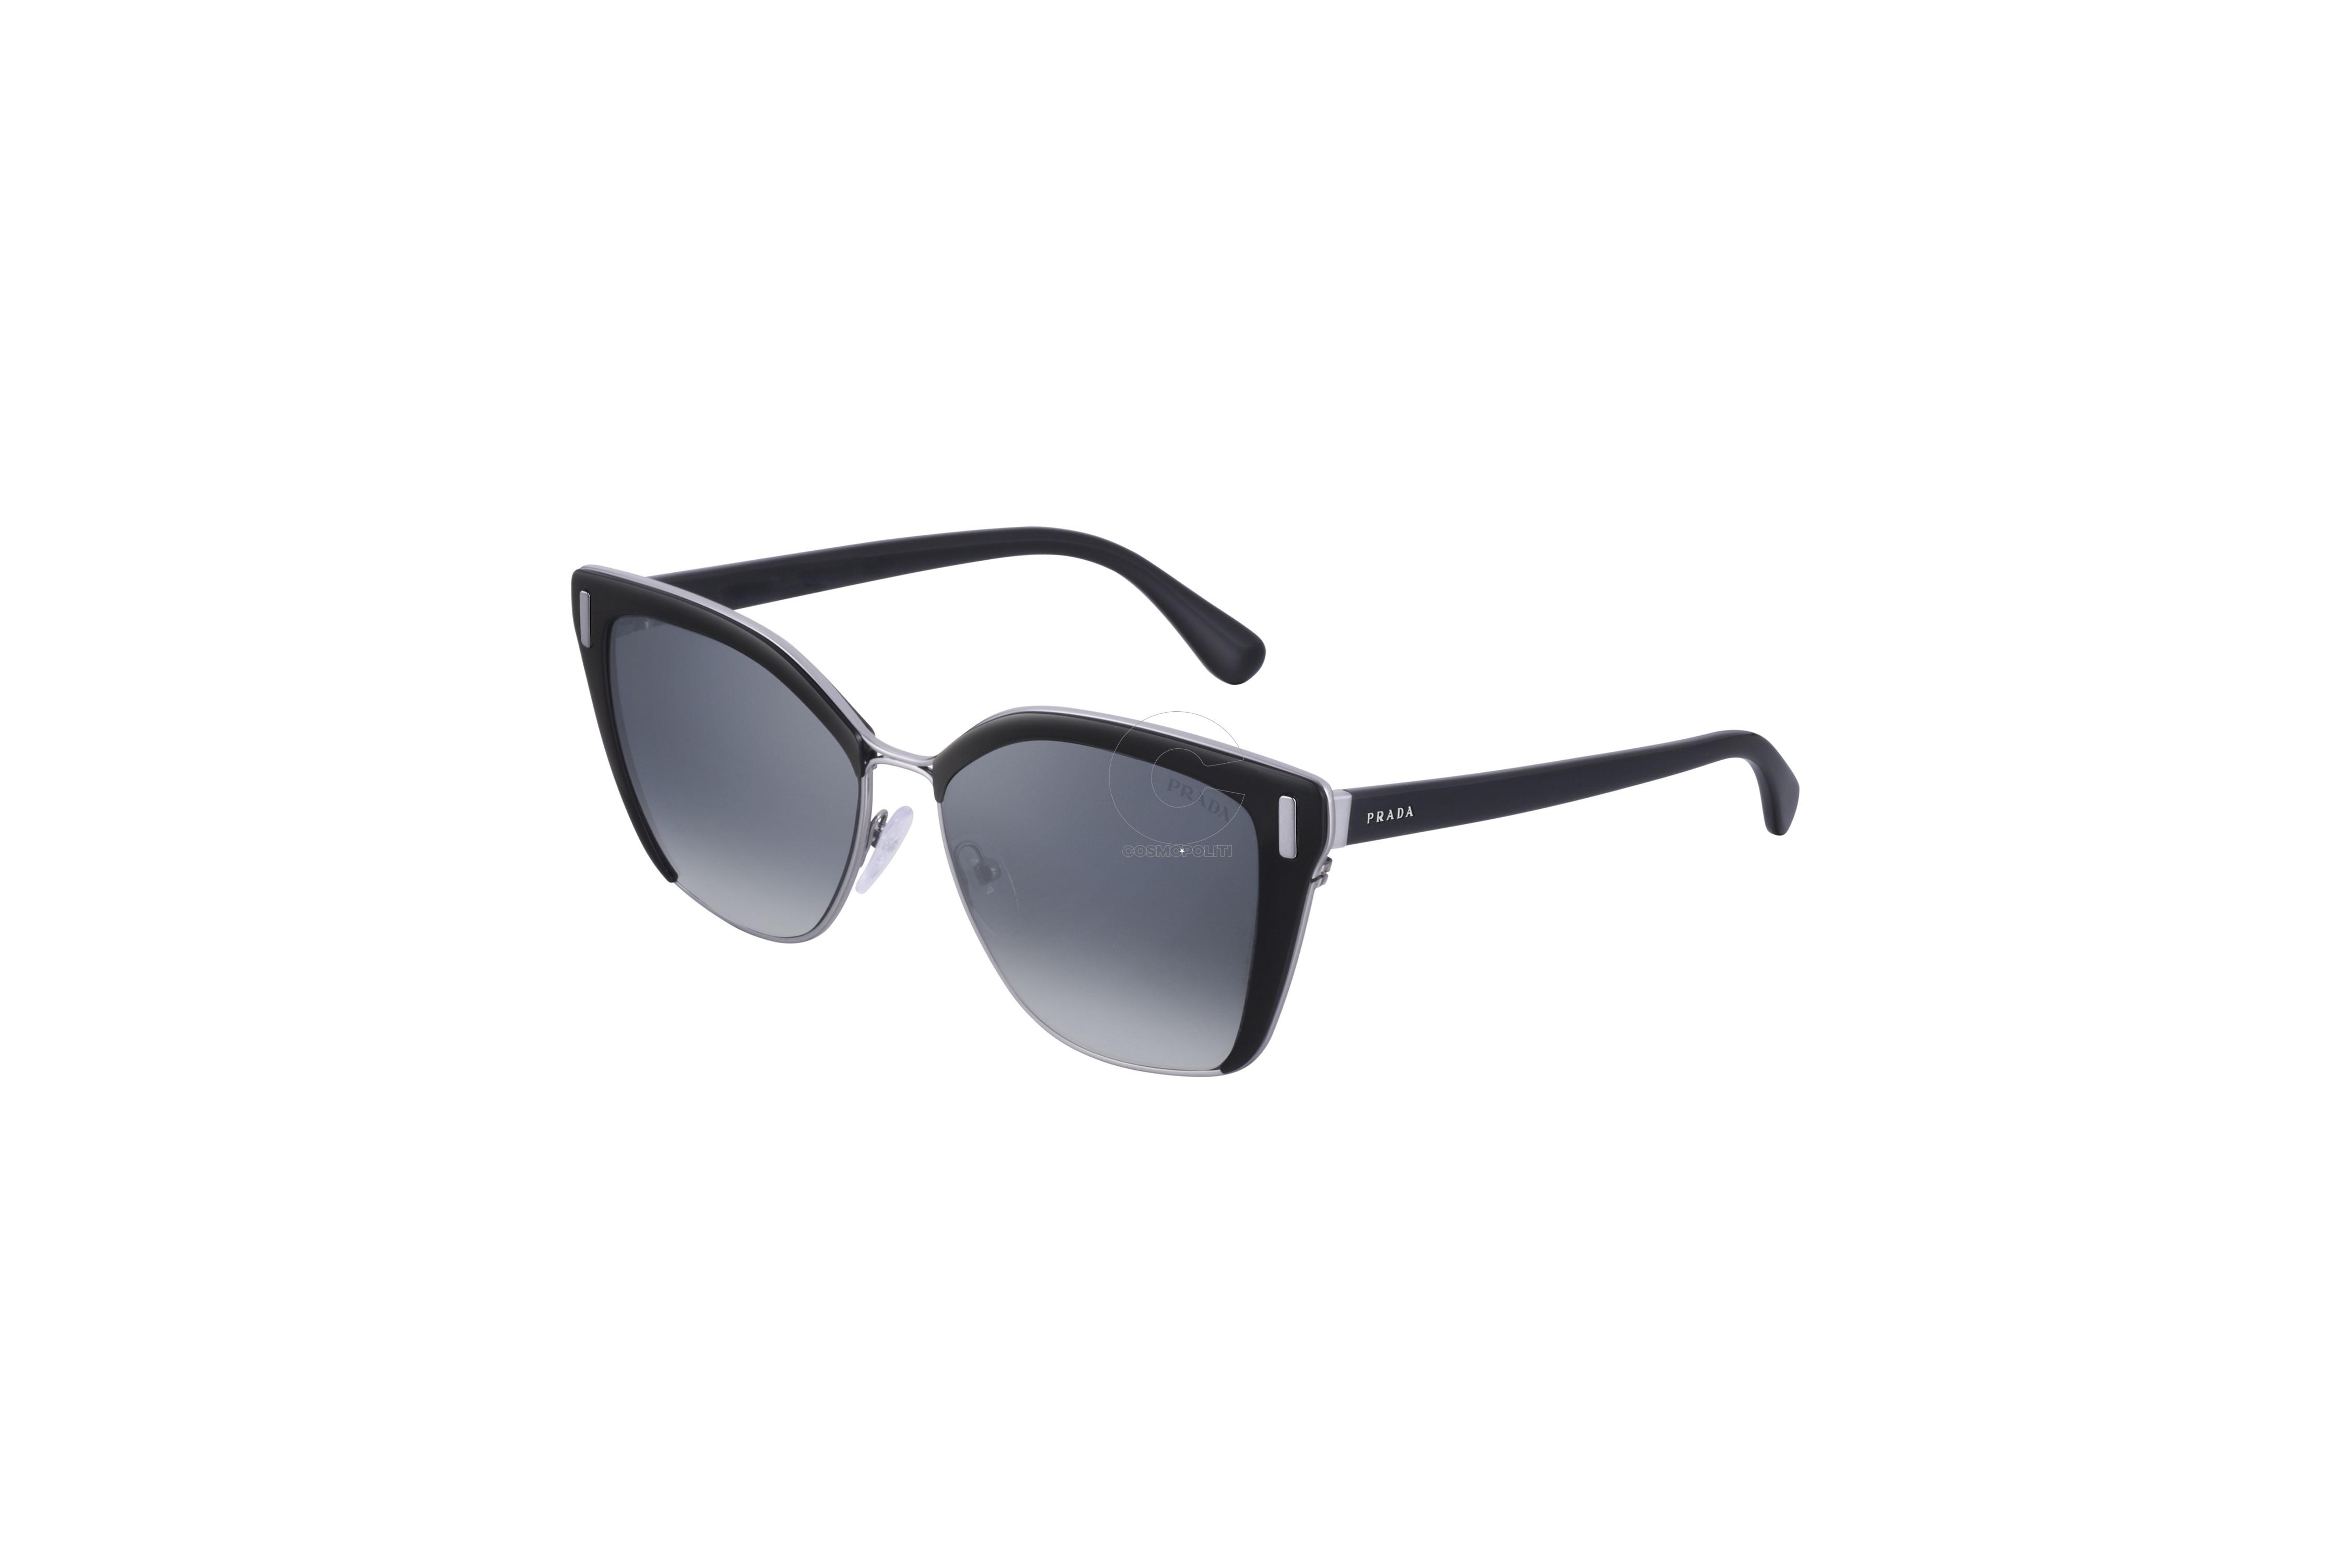 03791761dc Η νέα συλλογή γυαλιών Prada Άνοιξη   Καλοκαίρι 2017 - Cosmopoliti ...